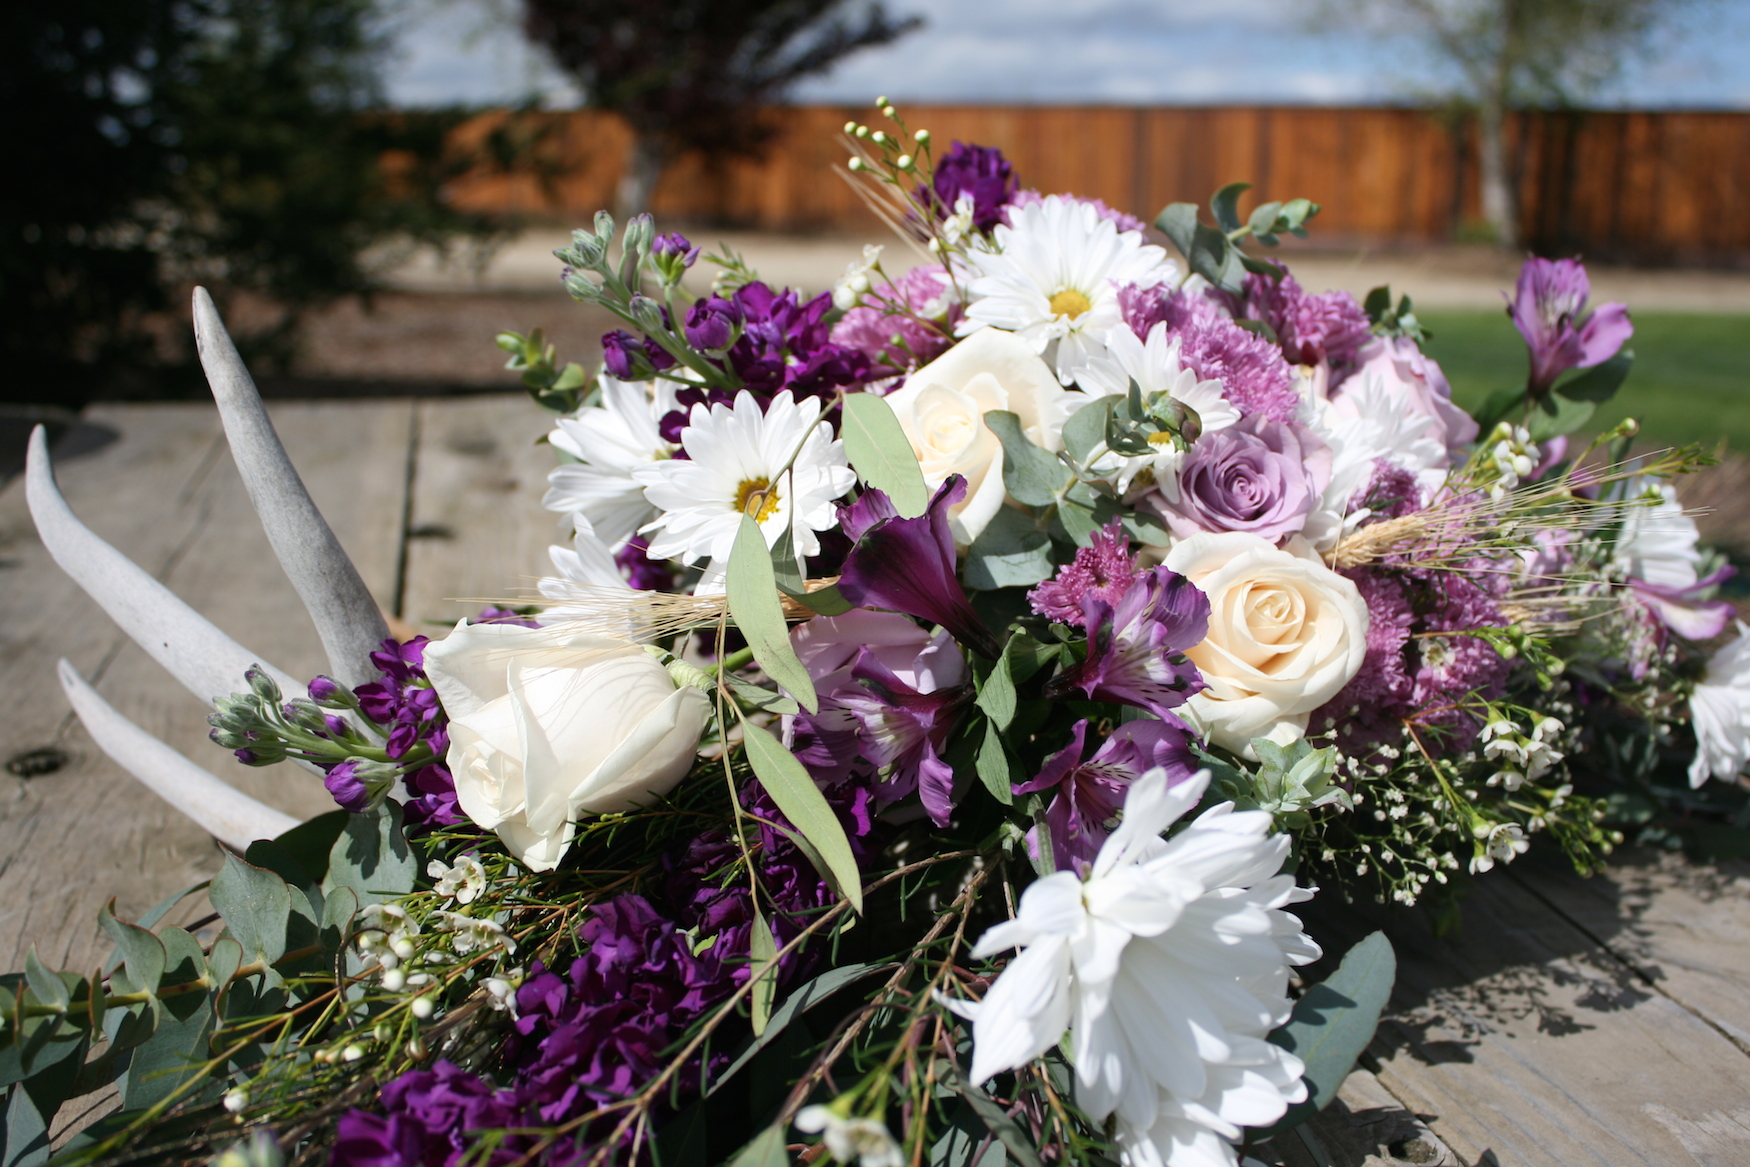 Feature piece floral arrangement with antler accent.